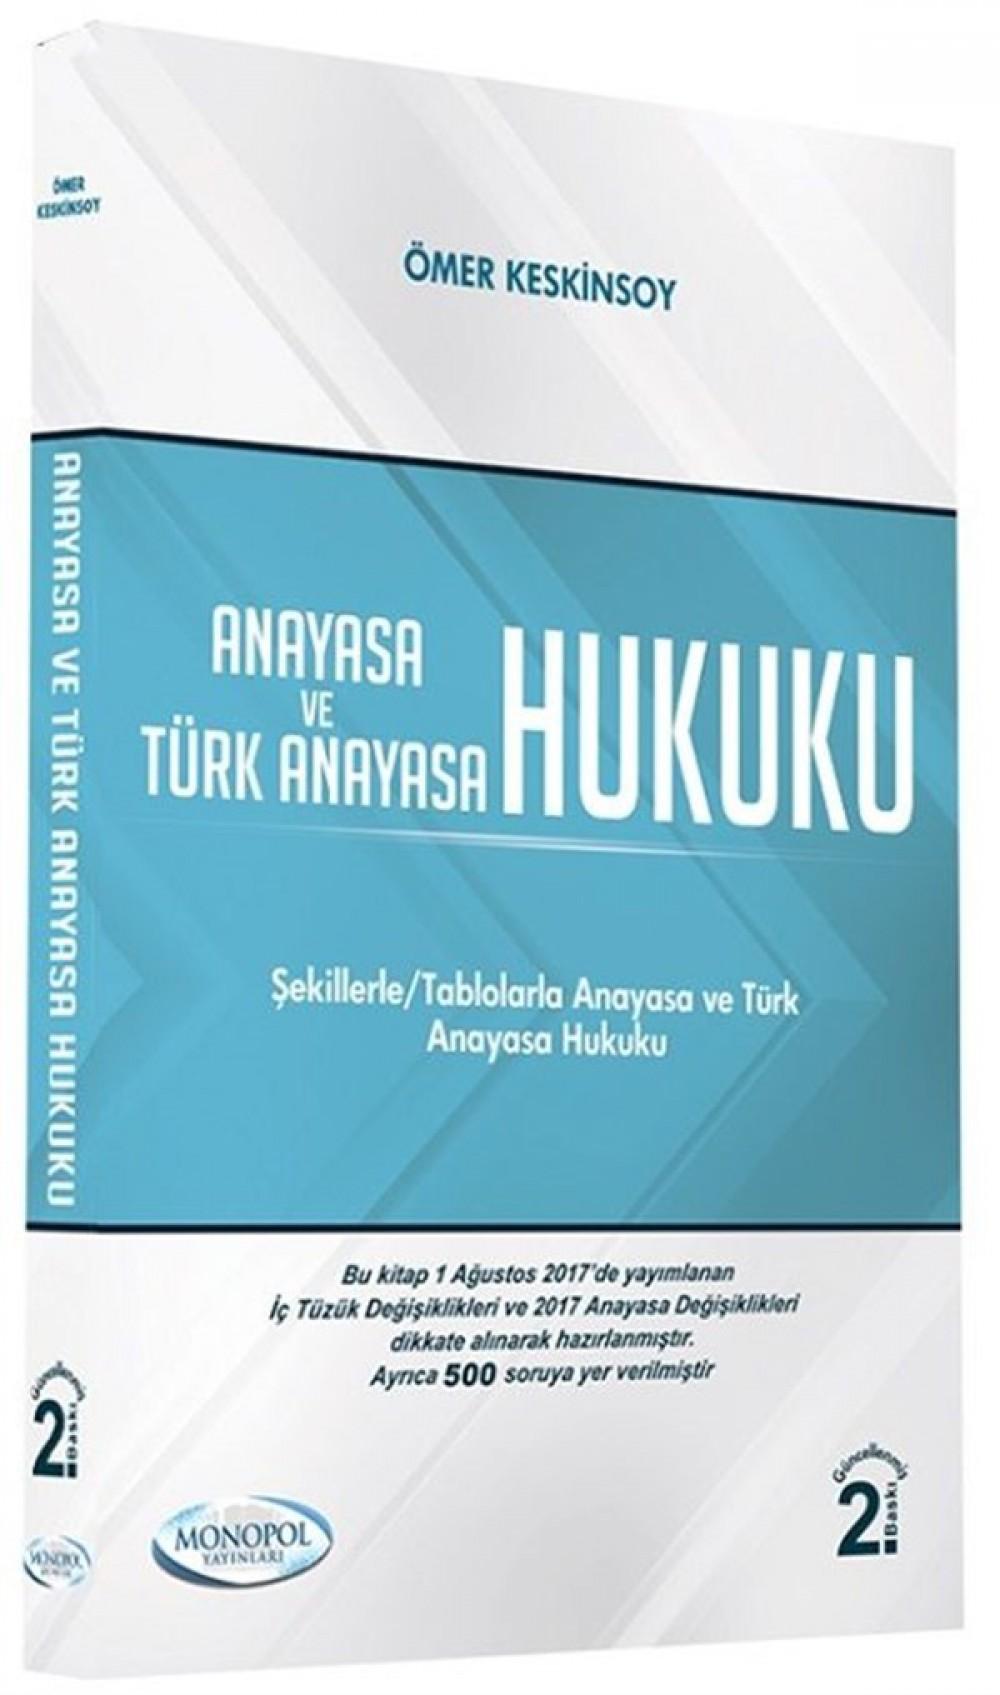 Monopol Yayınları KPSS A Grubu Anayasa ve Türk Anayasa Hukuku